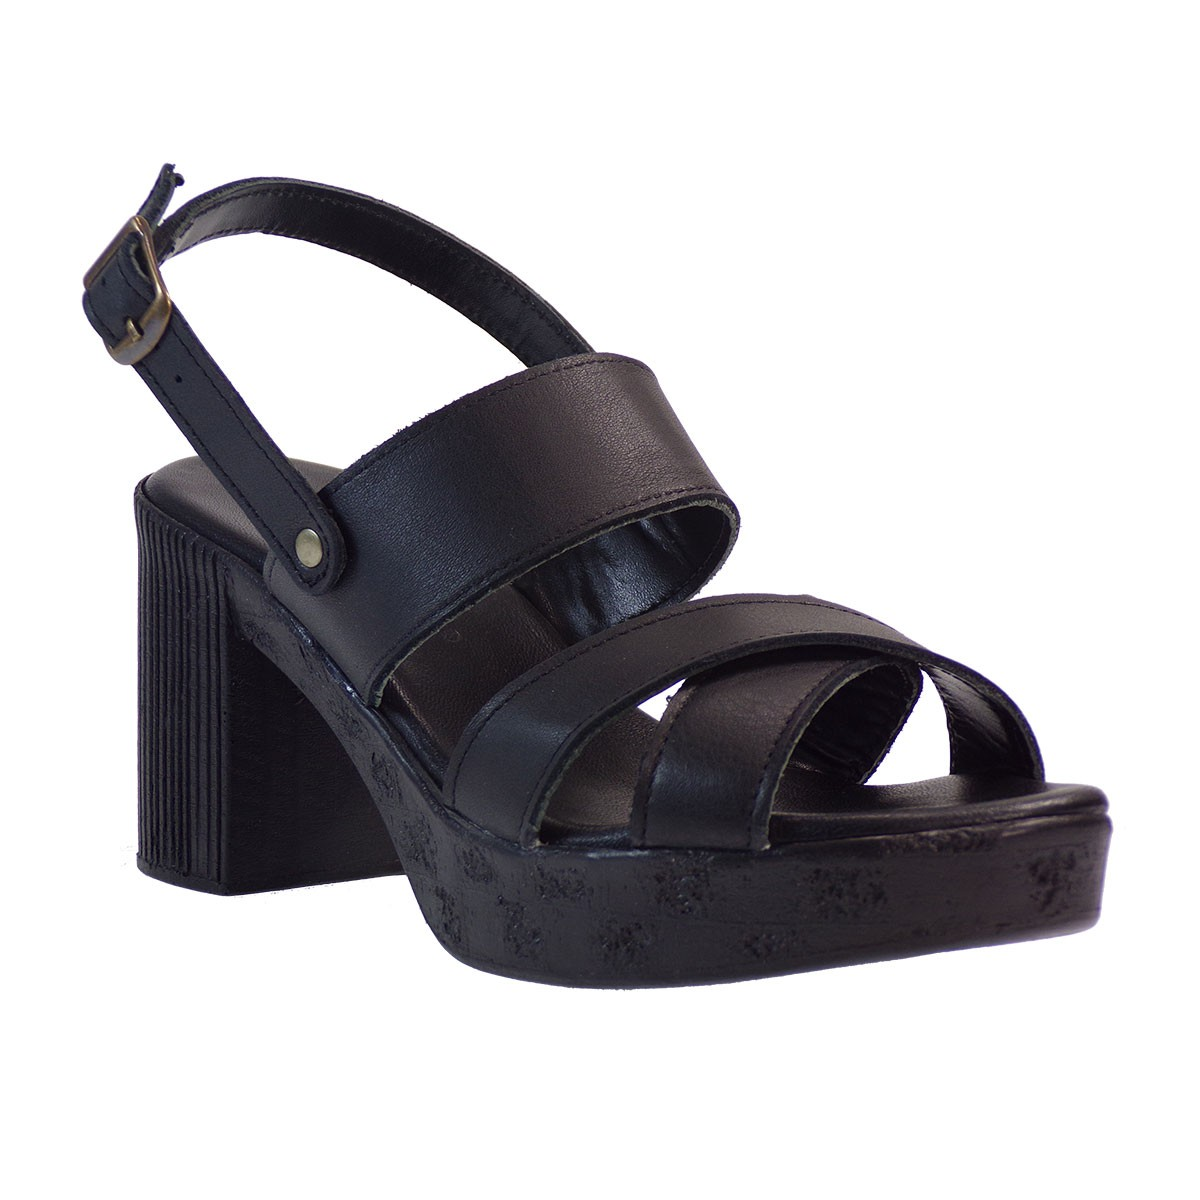 Commanchero Γυναικεία Πέδιλα 5484 Μαύρο Δέρμα